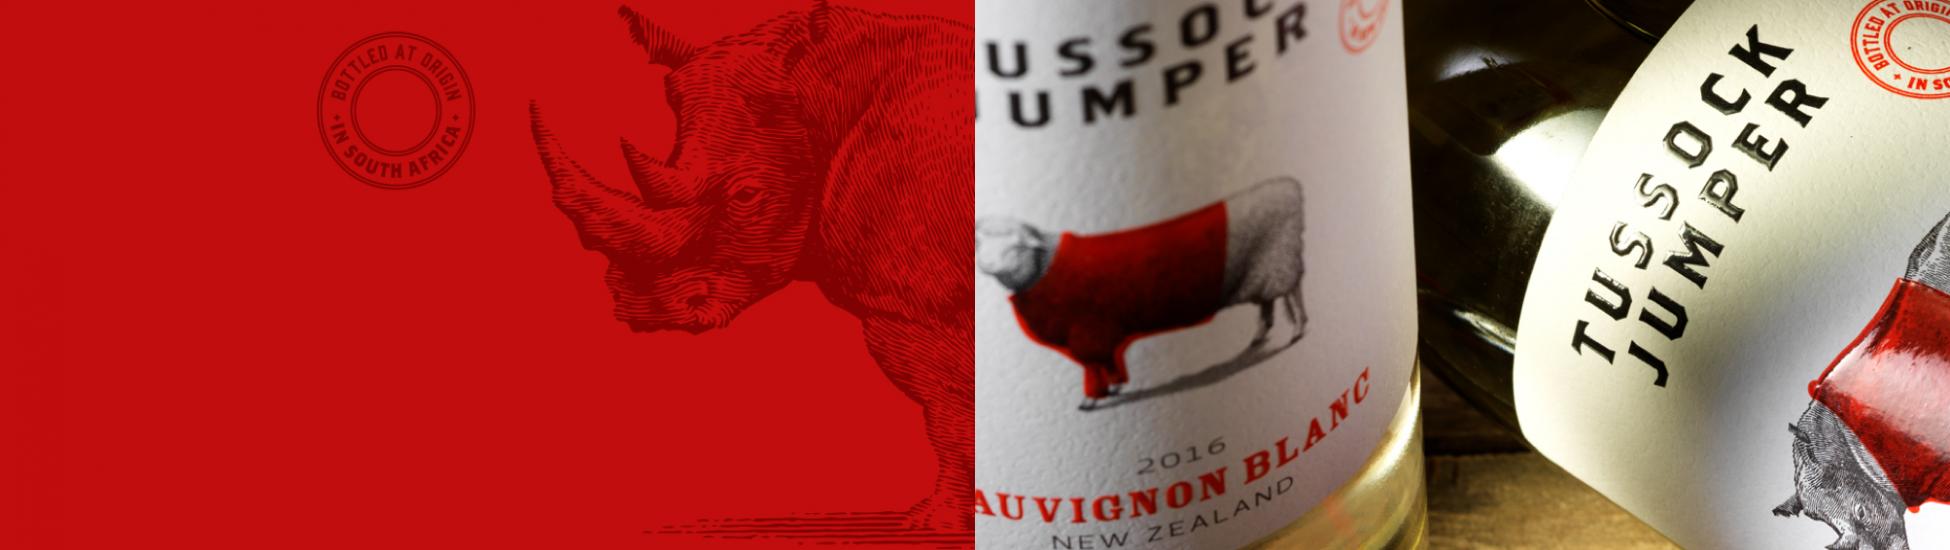 Tussock Jumper Wines - South Africa - Shiraz Grenache Viognier